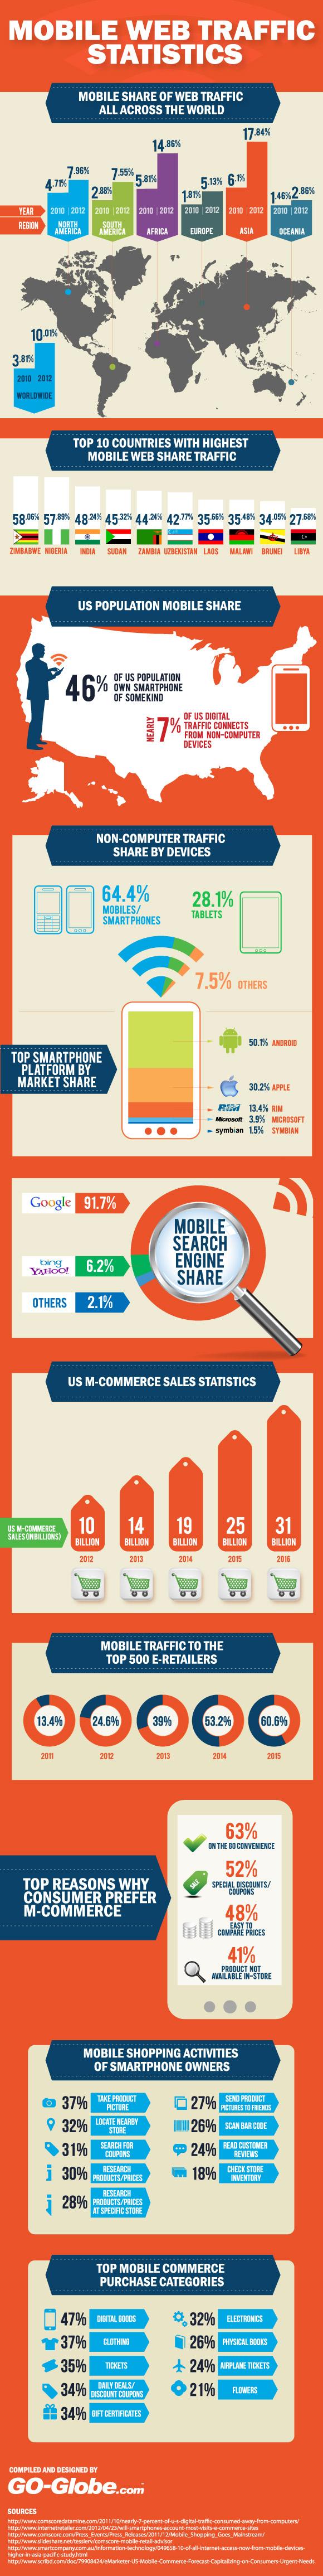 Mobile Web Traffic Statistics